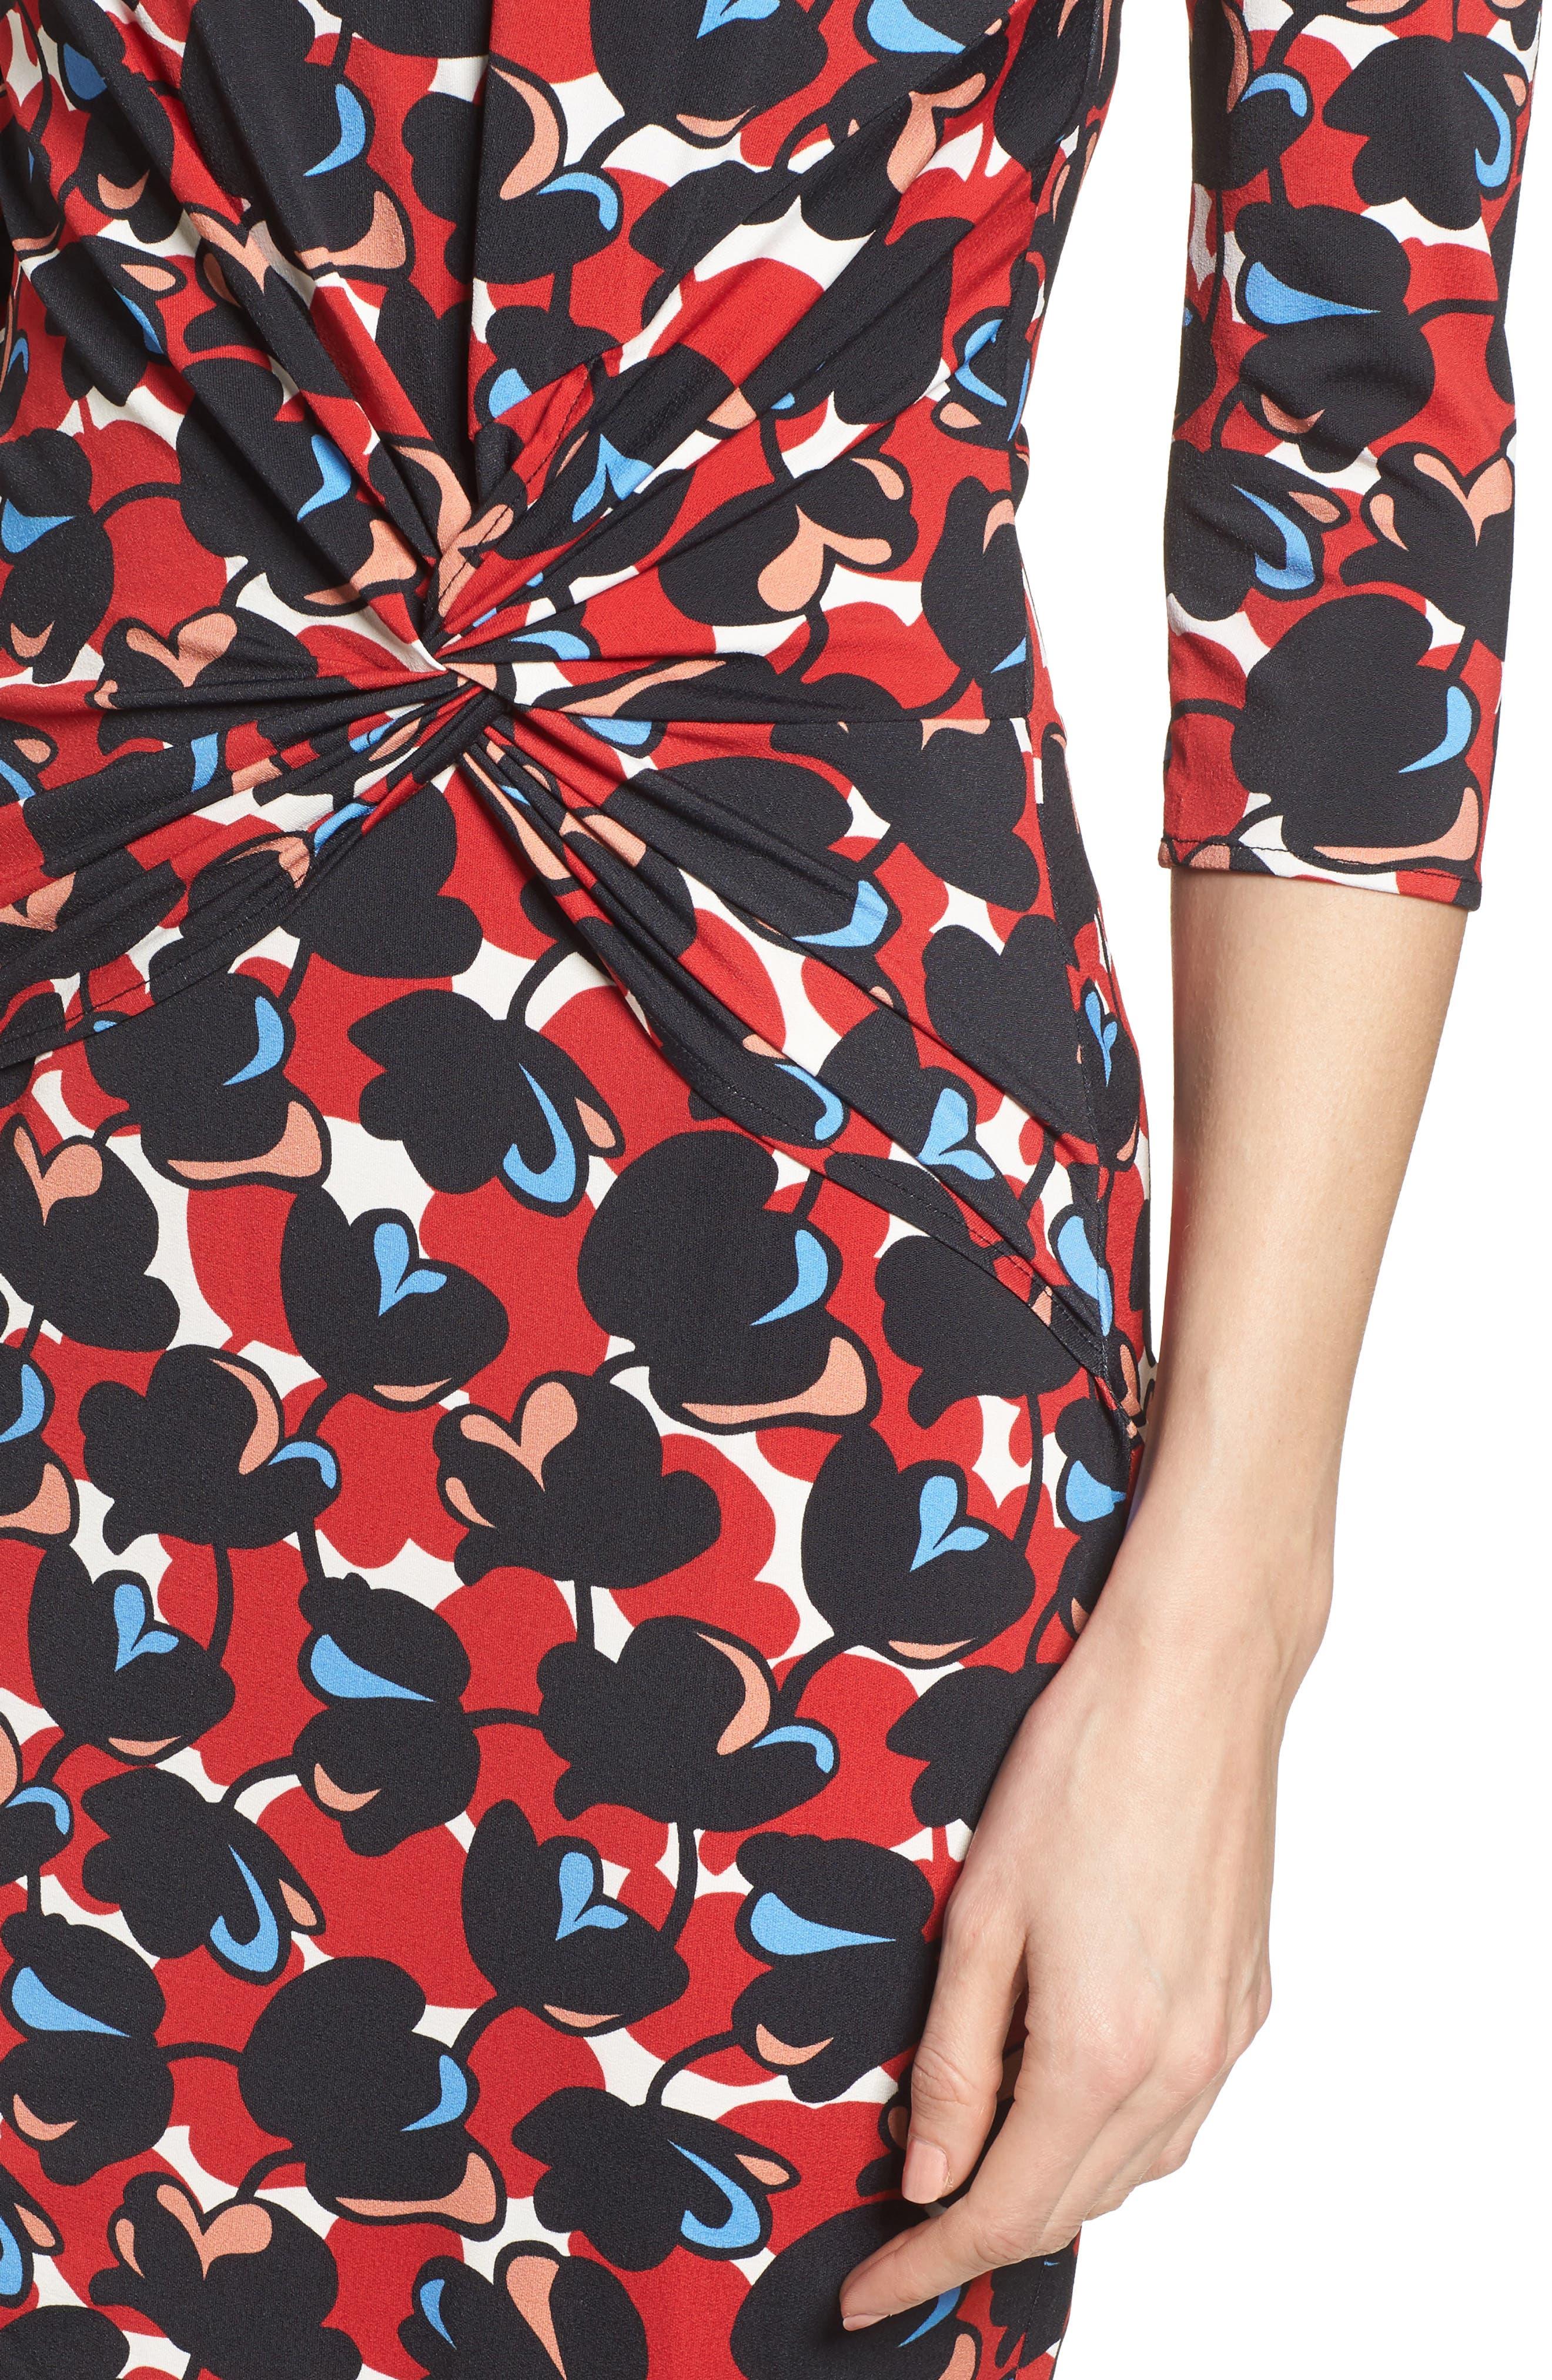 Eleika Print Jersey Sheath Dress,                             Alternate thumbnail 4, color,                             Multicolor Flower Print